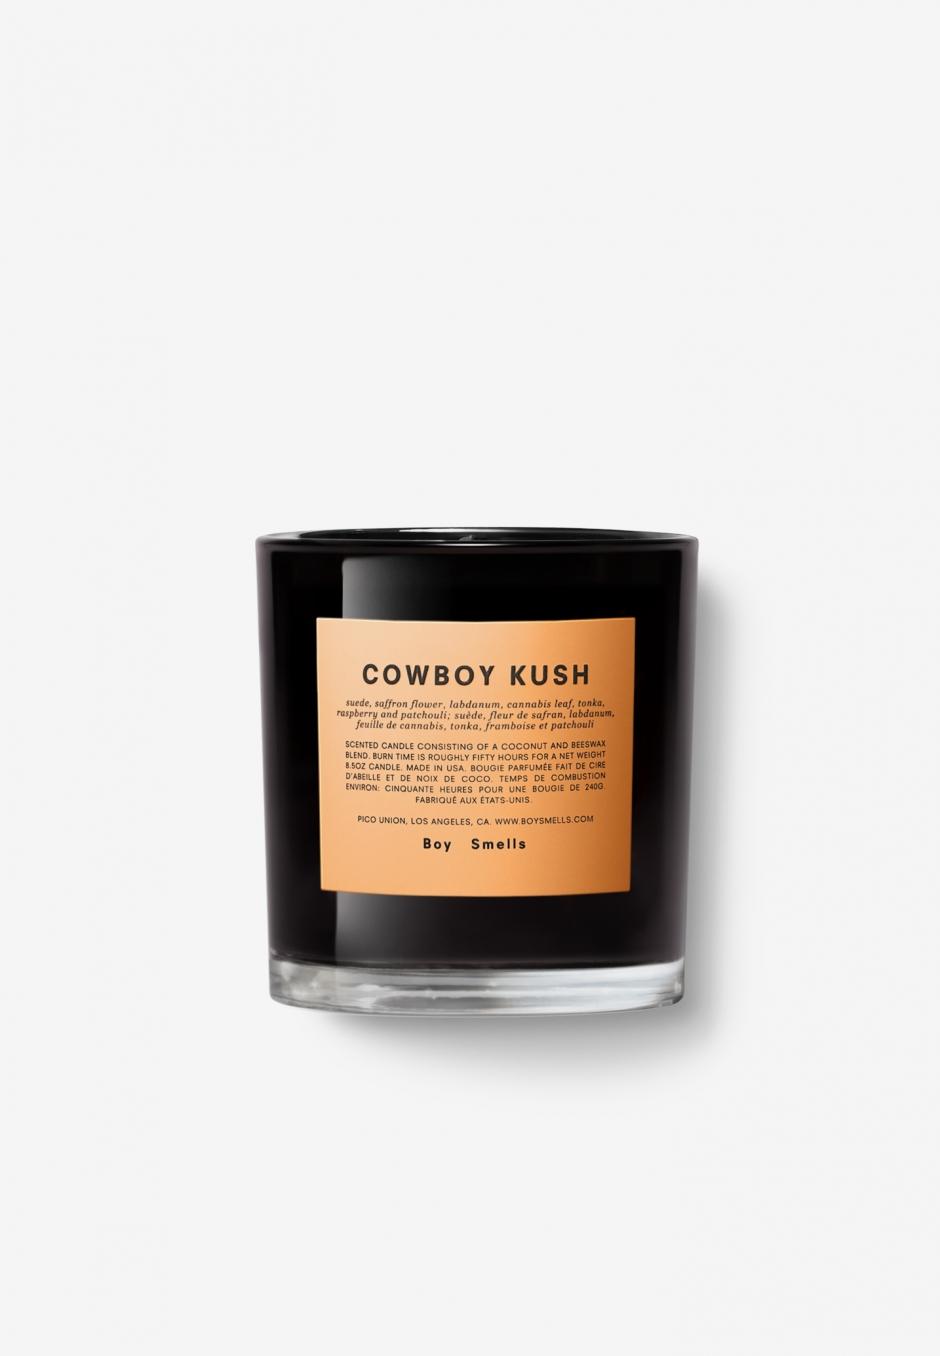 Boy Smells Cowboy Kush